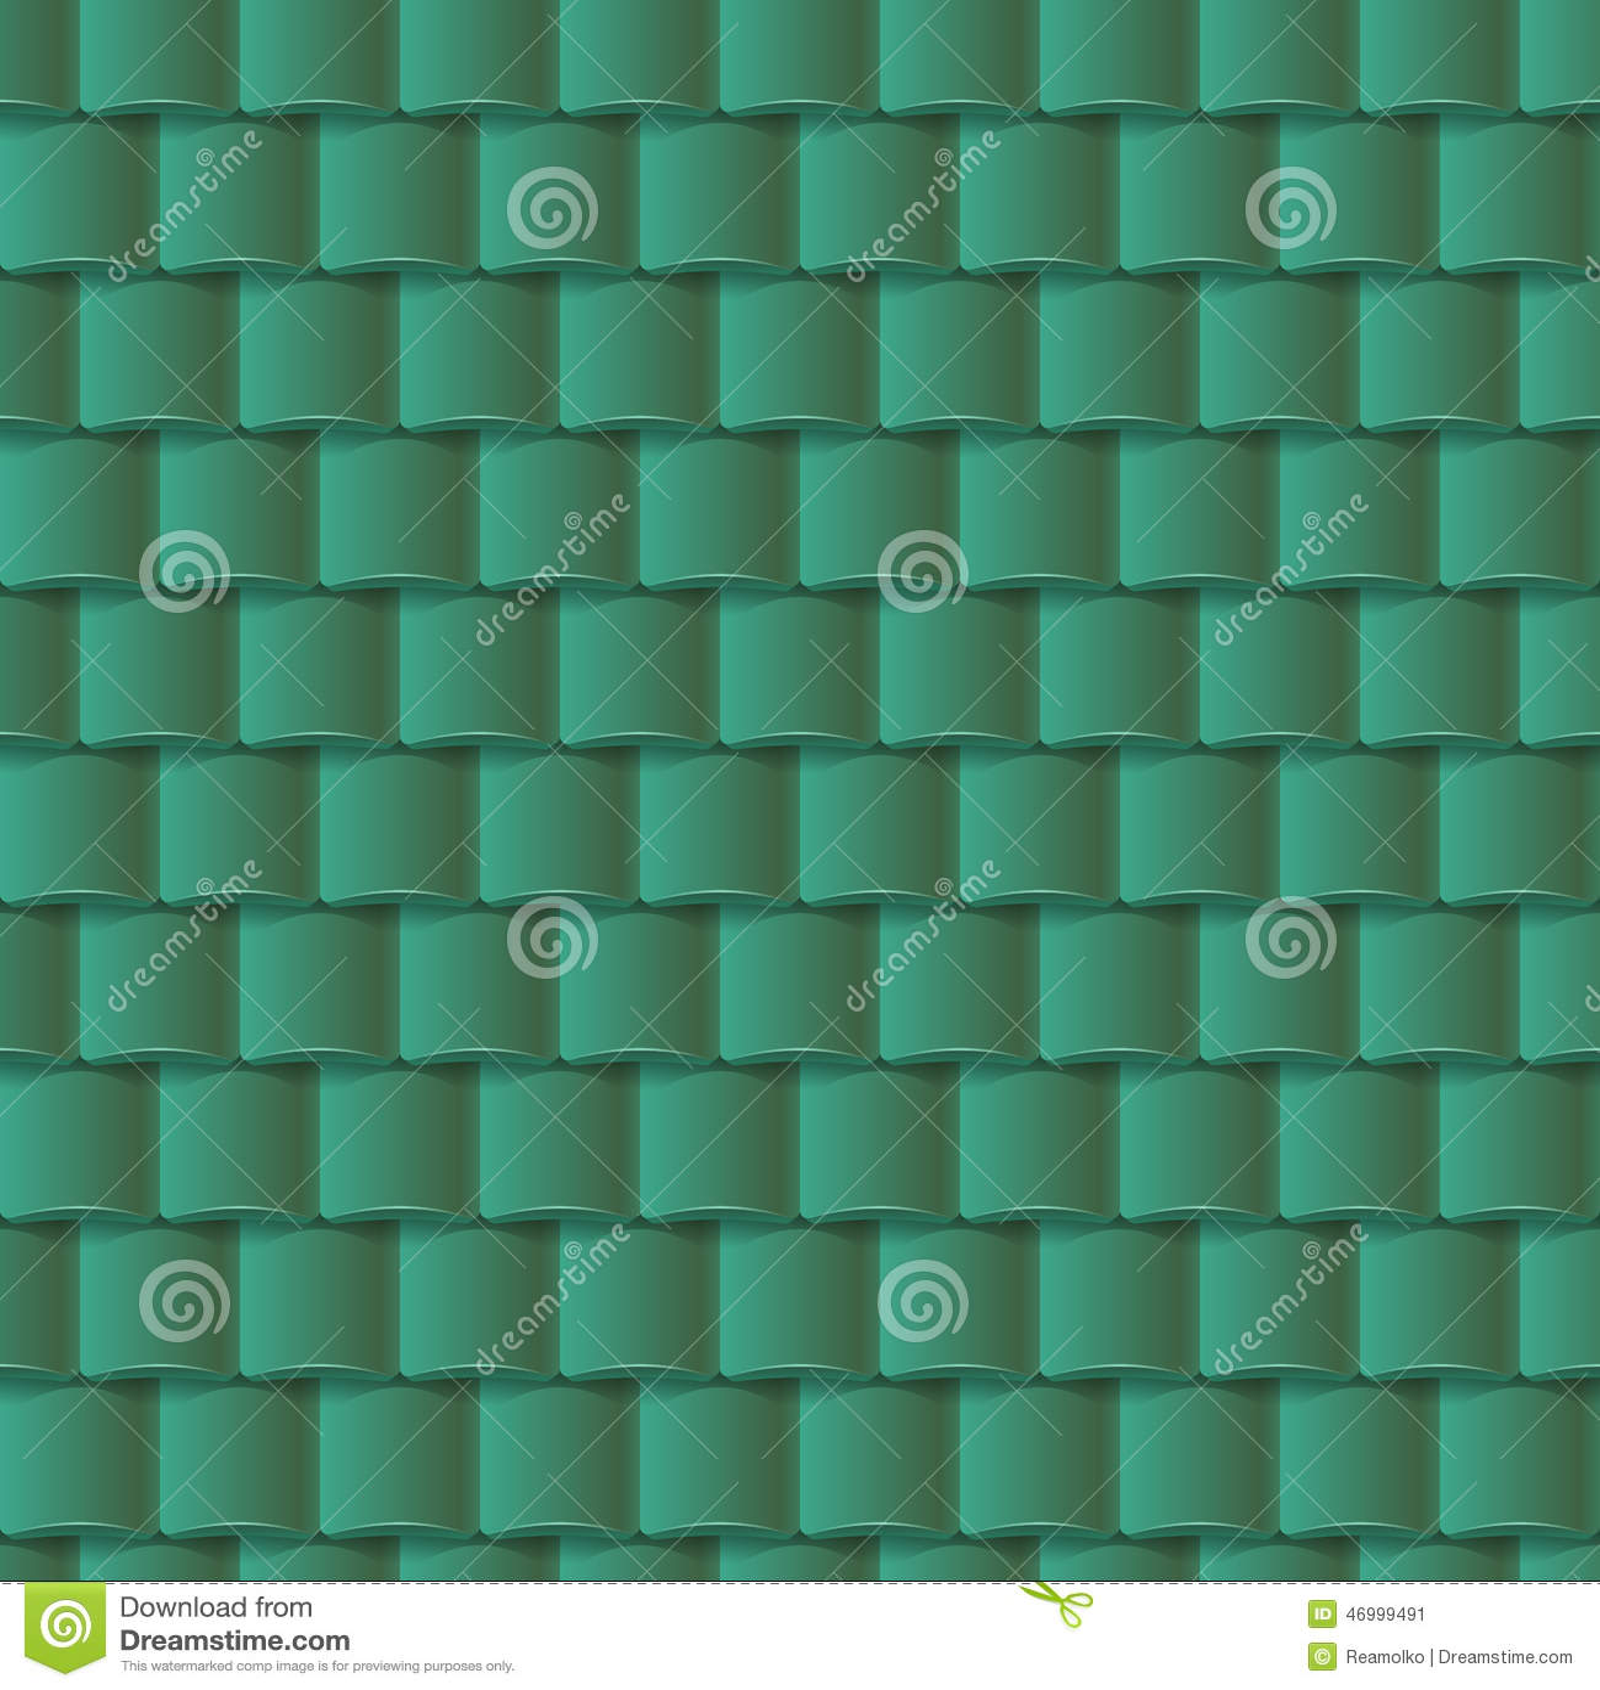 Seamless Roof Tiles Pattern Green Texture Stock Vector